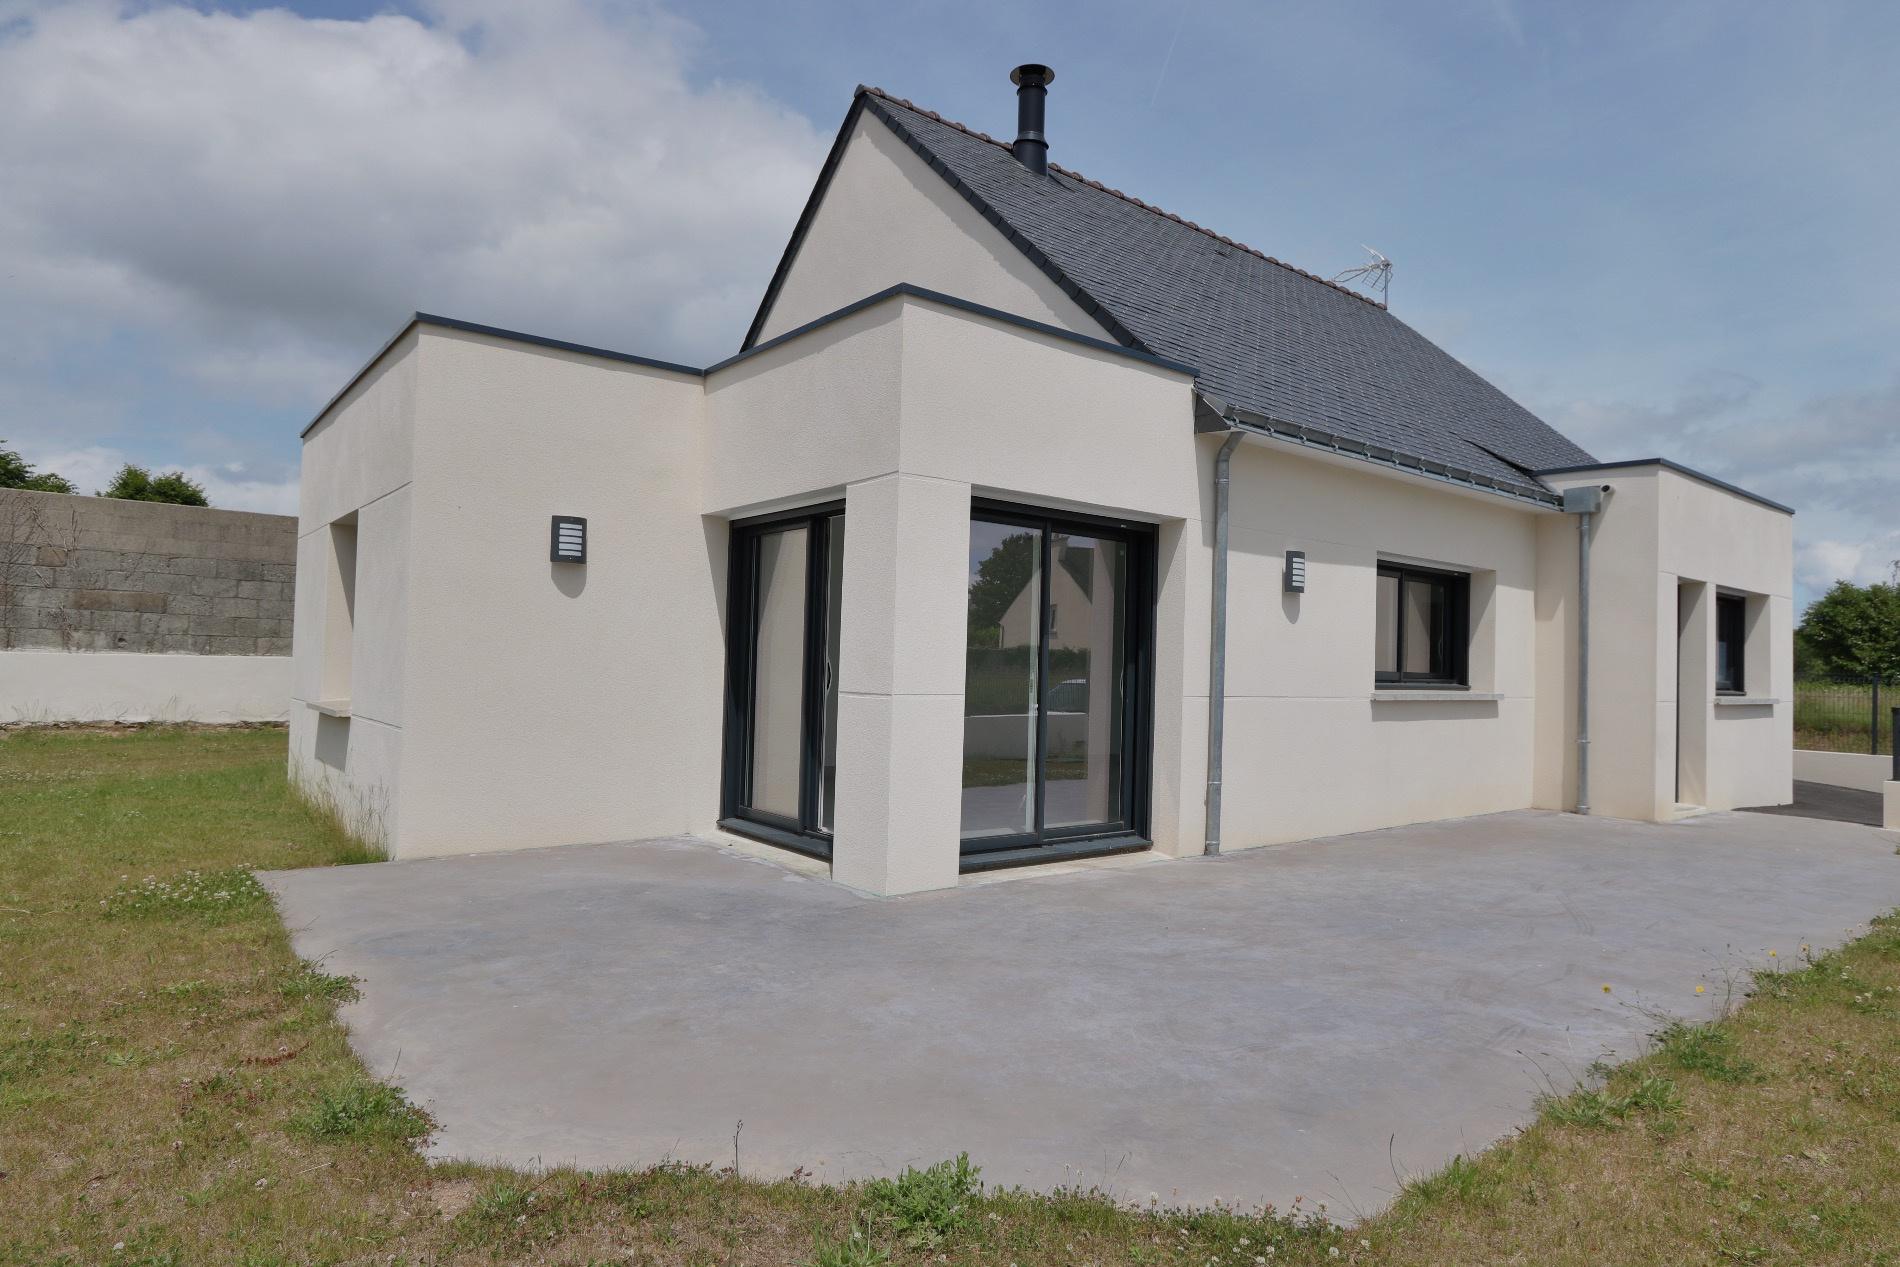 Vente maison neuve de plain pied adapt e aux pmr for Vente maison neuve 85